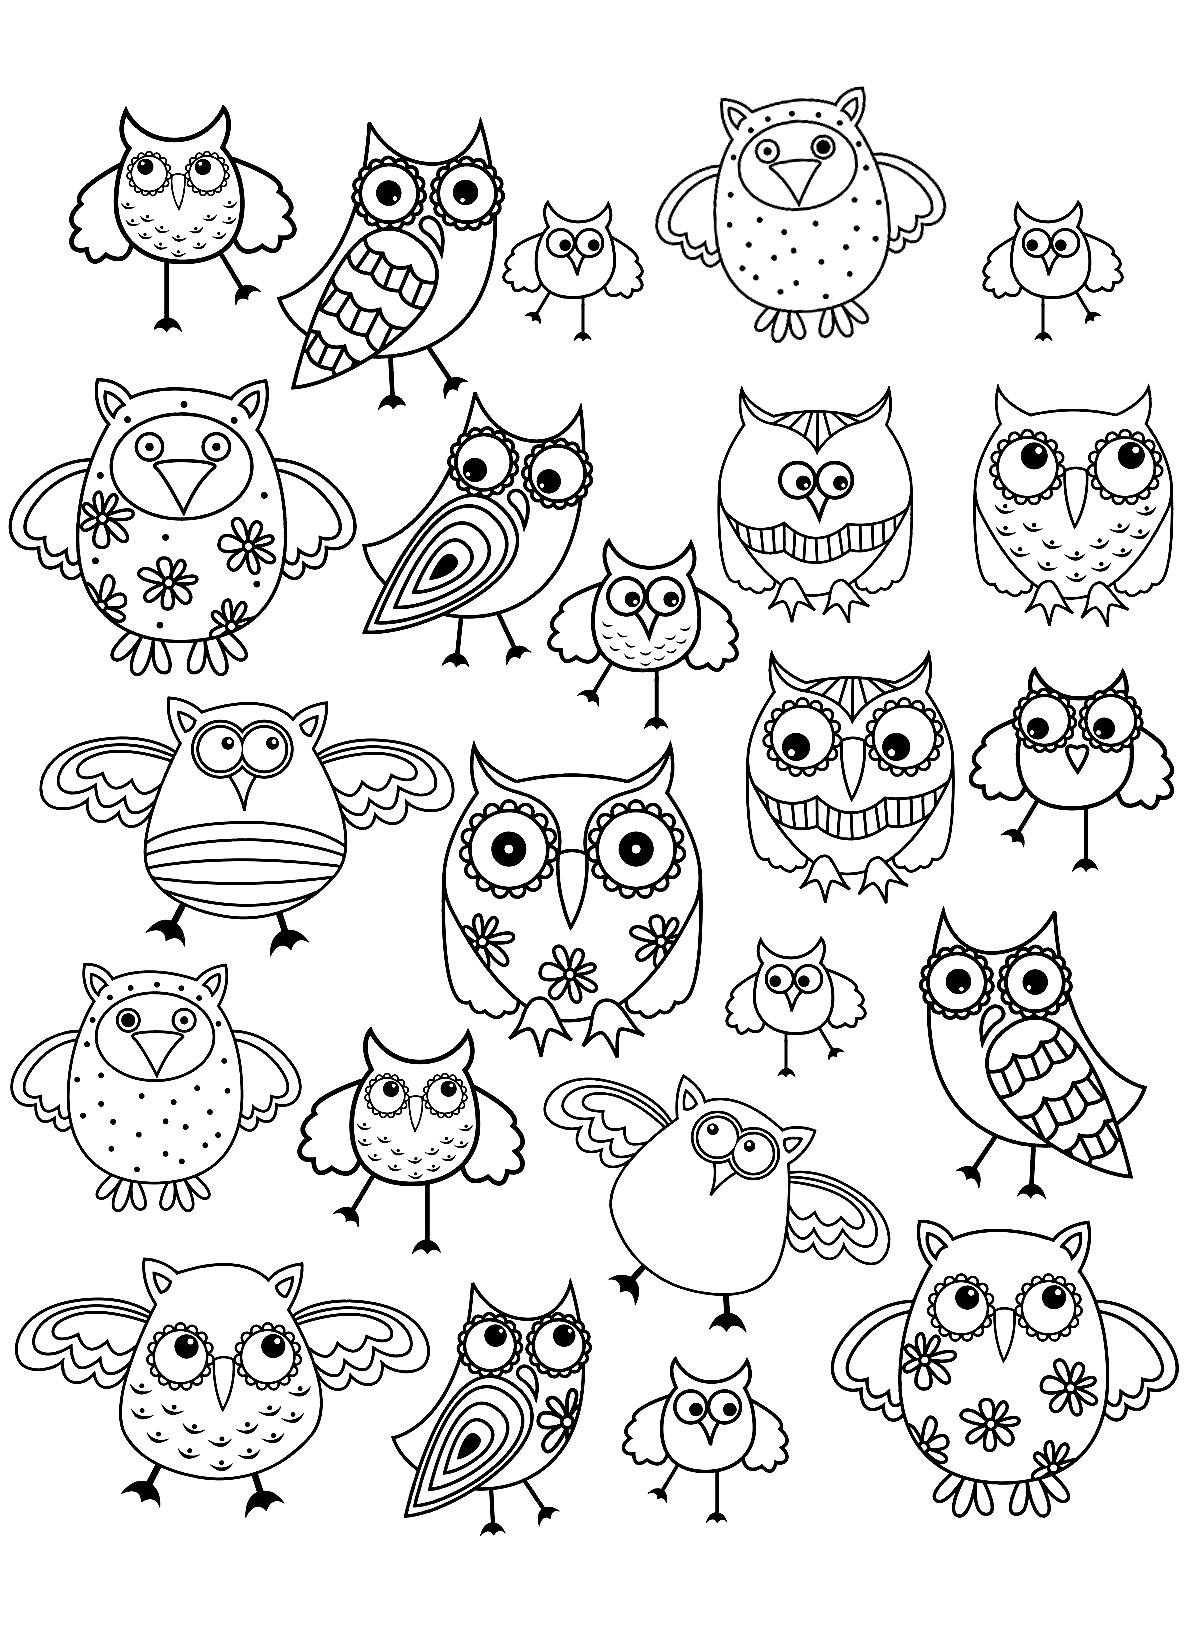 Disegni da colorare per adulti : Doodle art / Doodling - 48